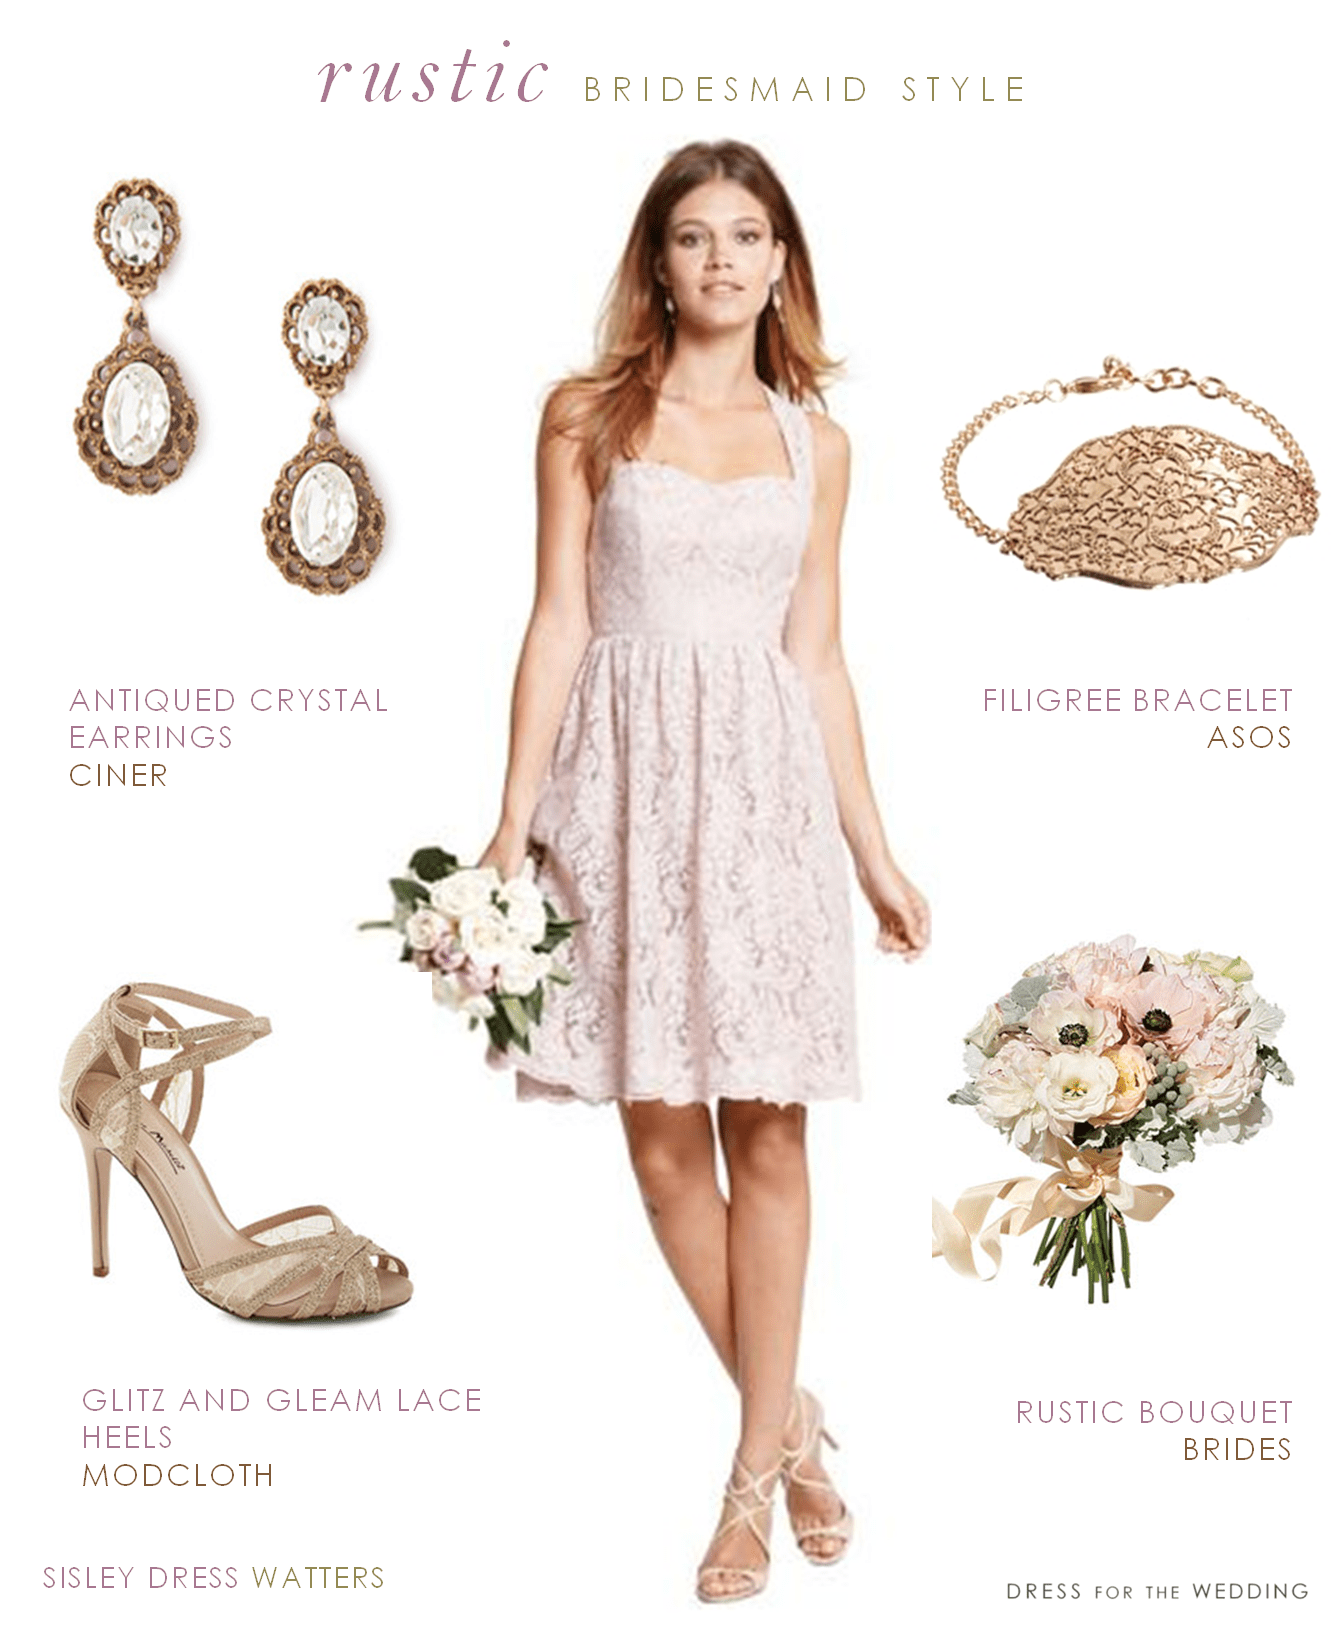 Bridesmaid Dress for a Rustic Wedding